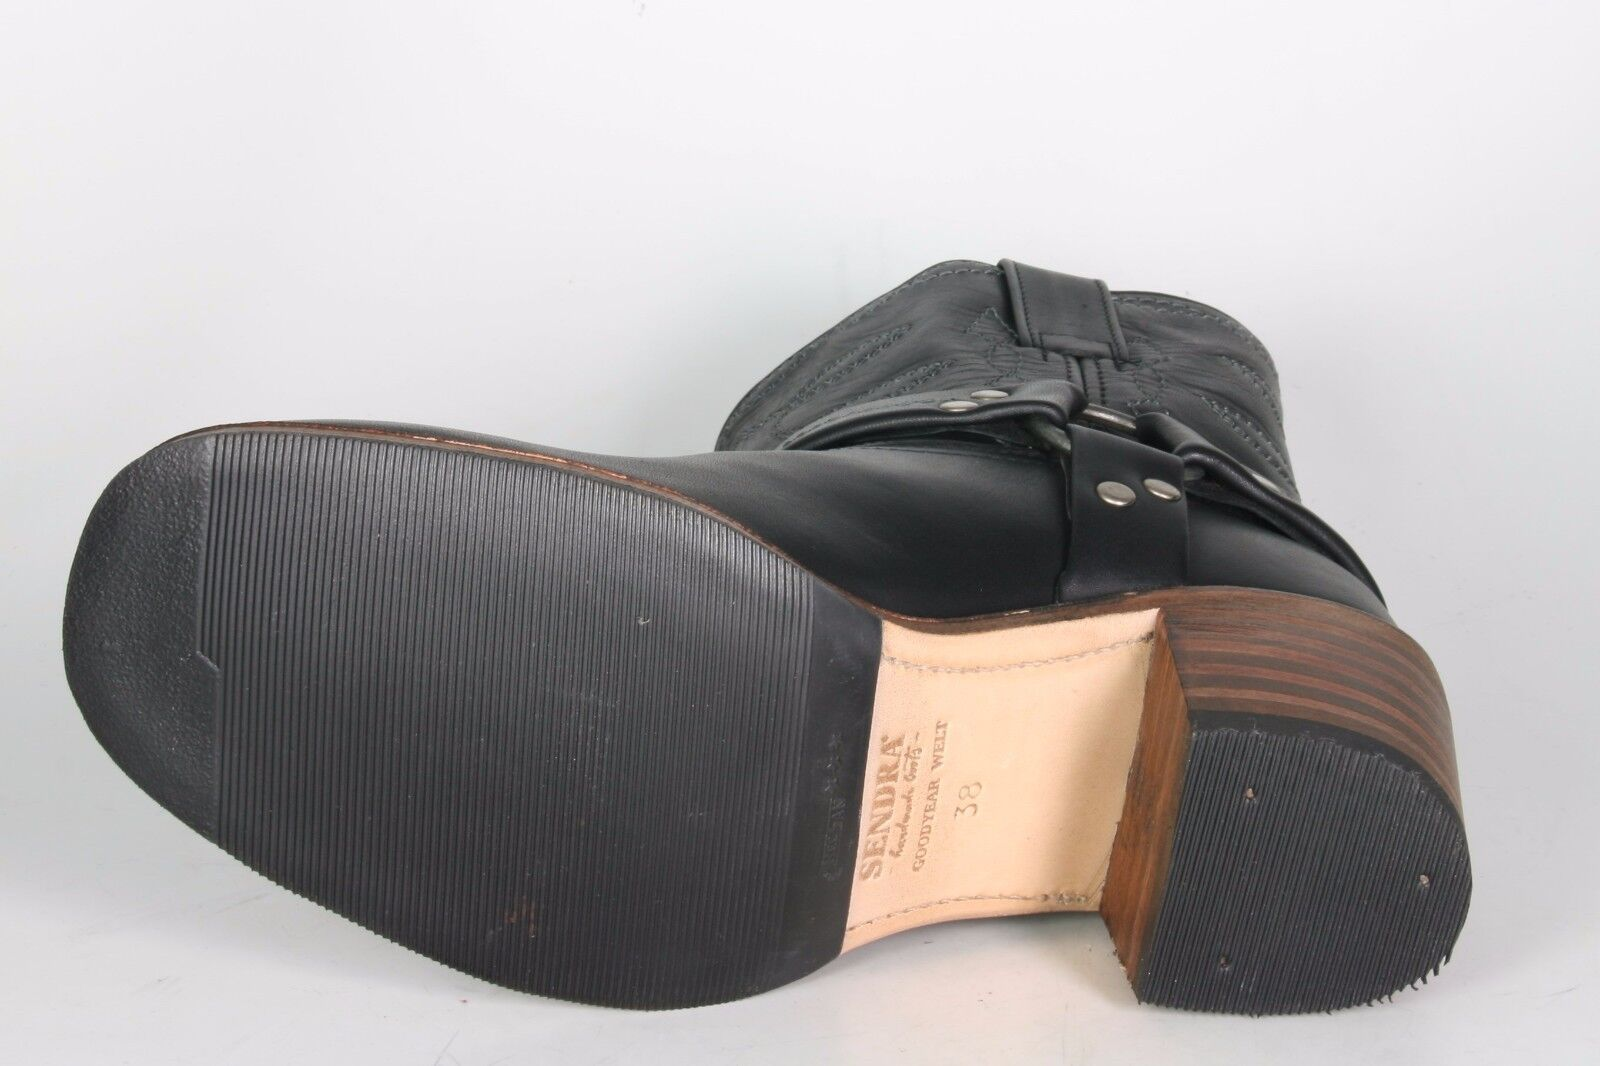 9569 Stiefeletten Sendra Stiefeletten 9569 Negro Rahmengenähte Schuhe BikerStiefel 6afa90